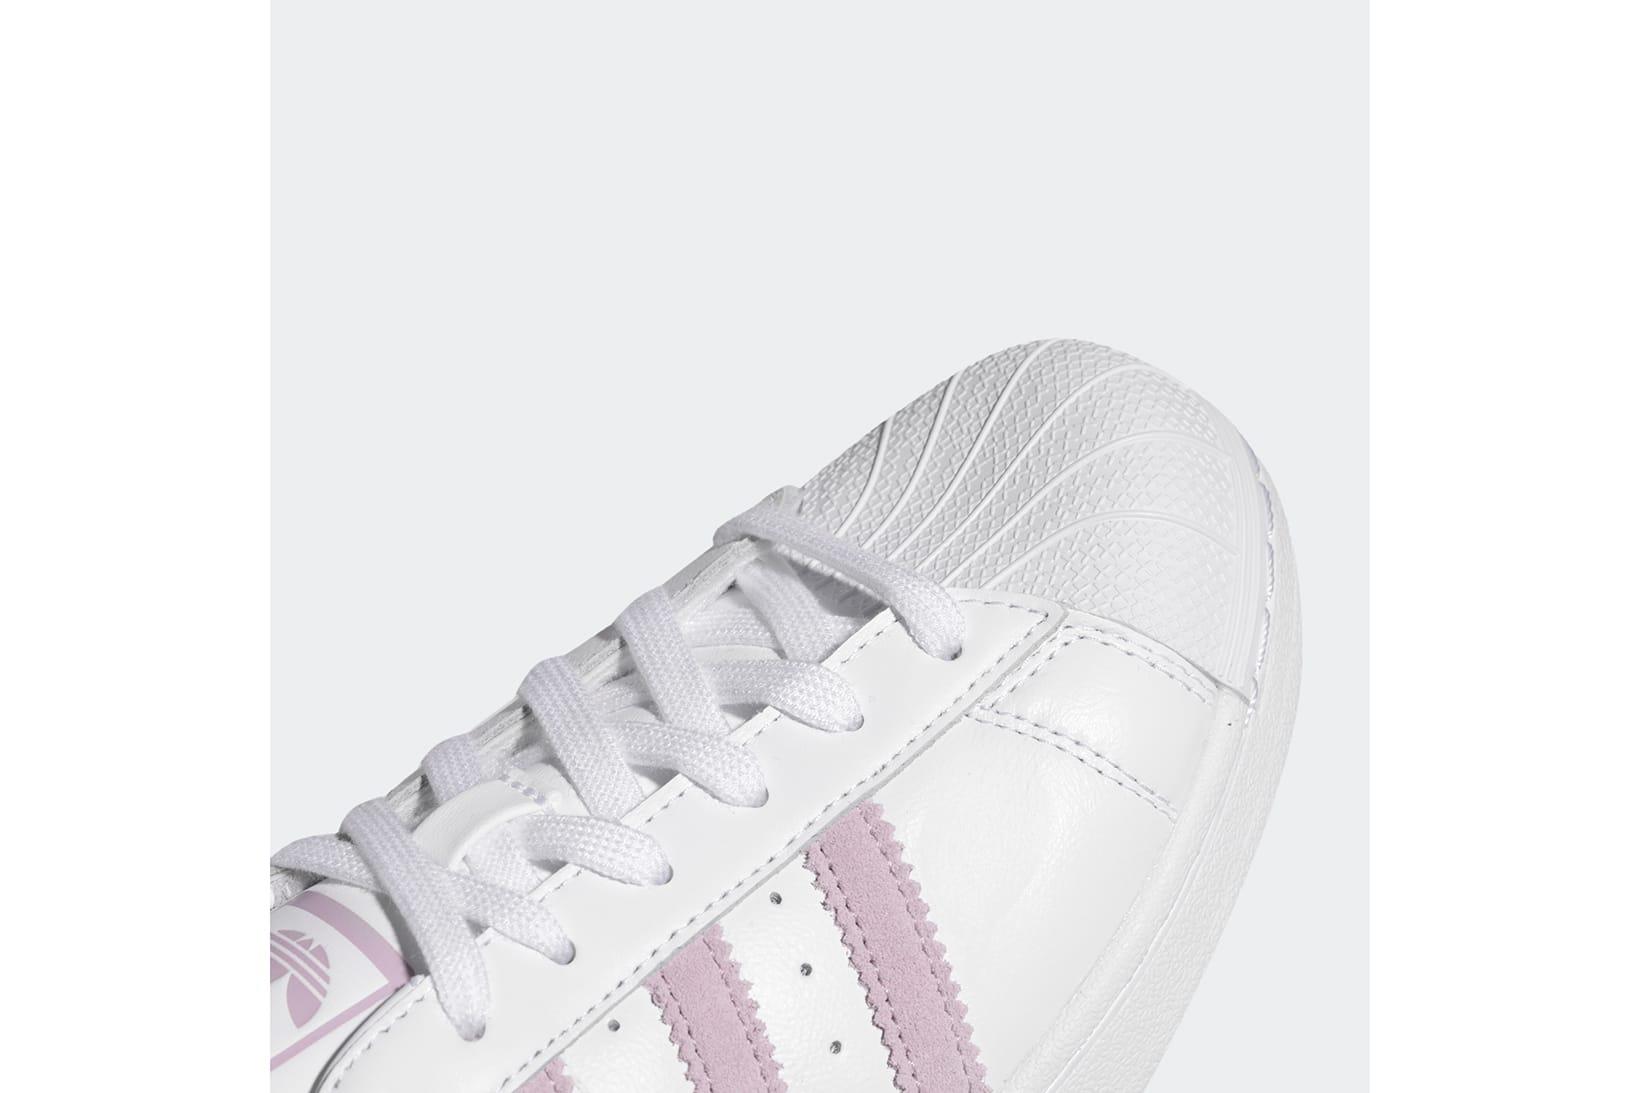 adidas Originals' Superstar Arrives in